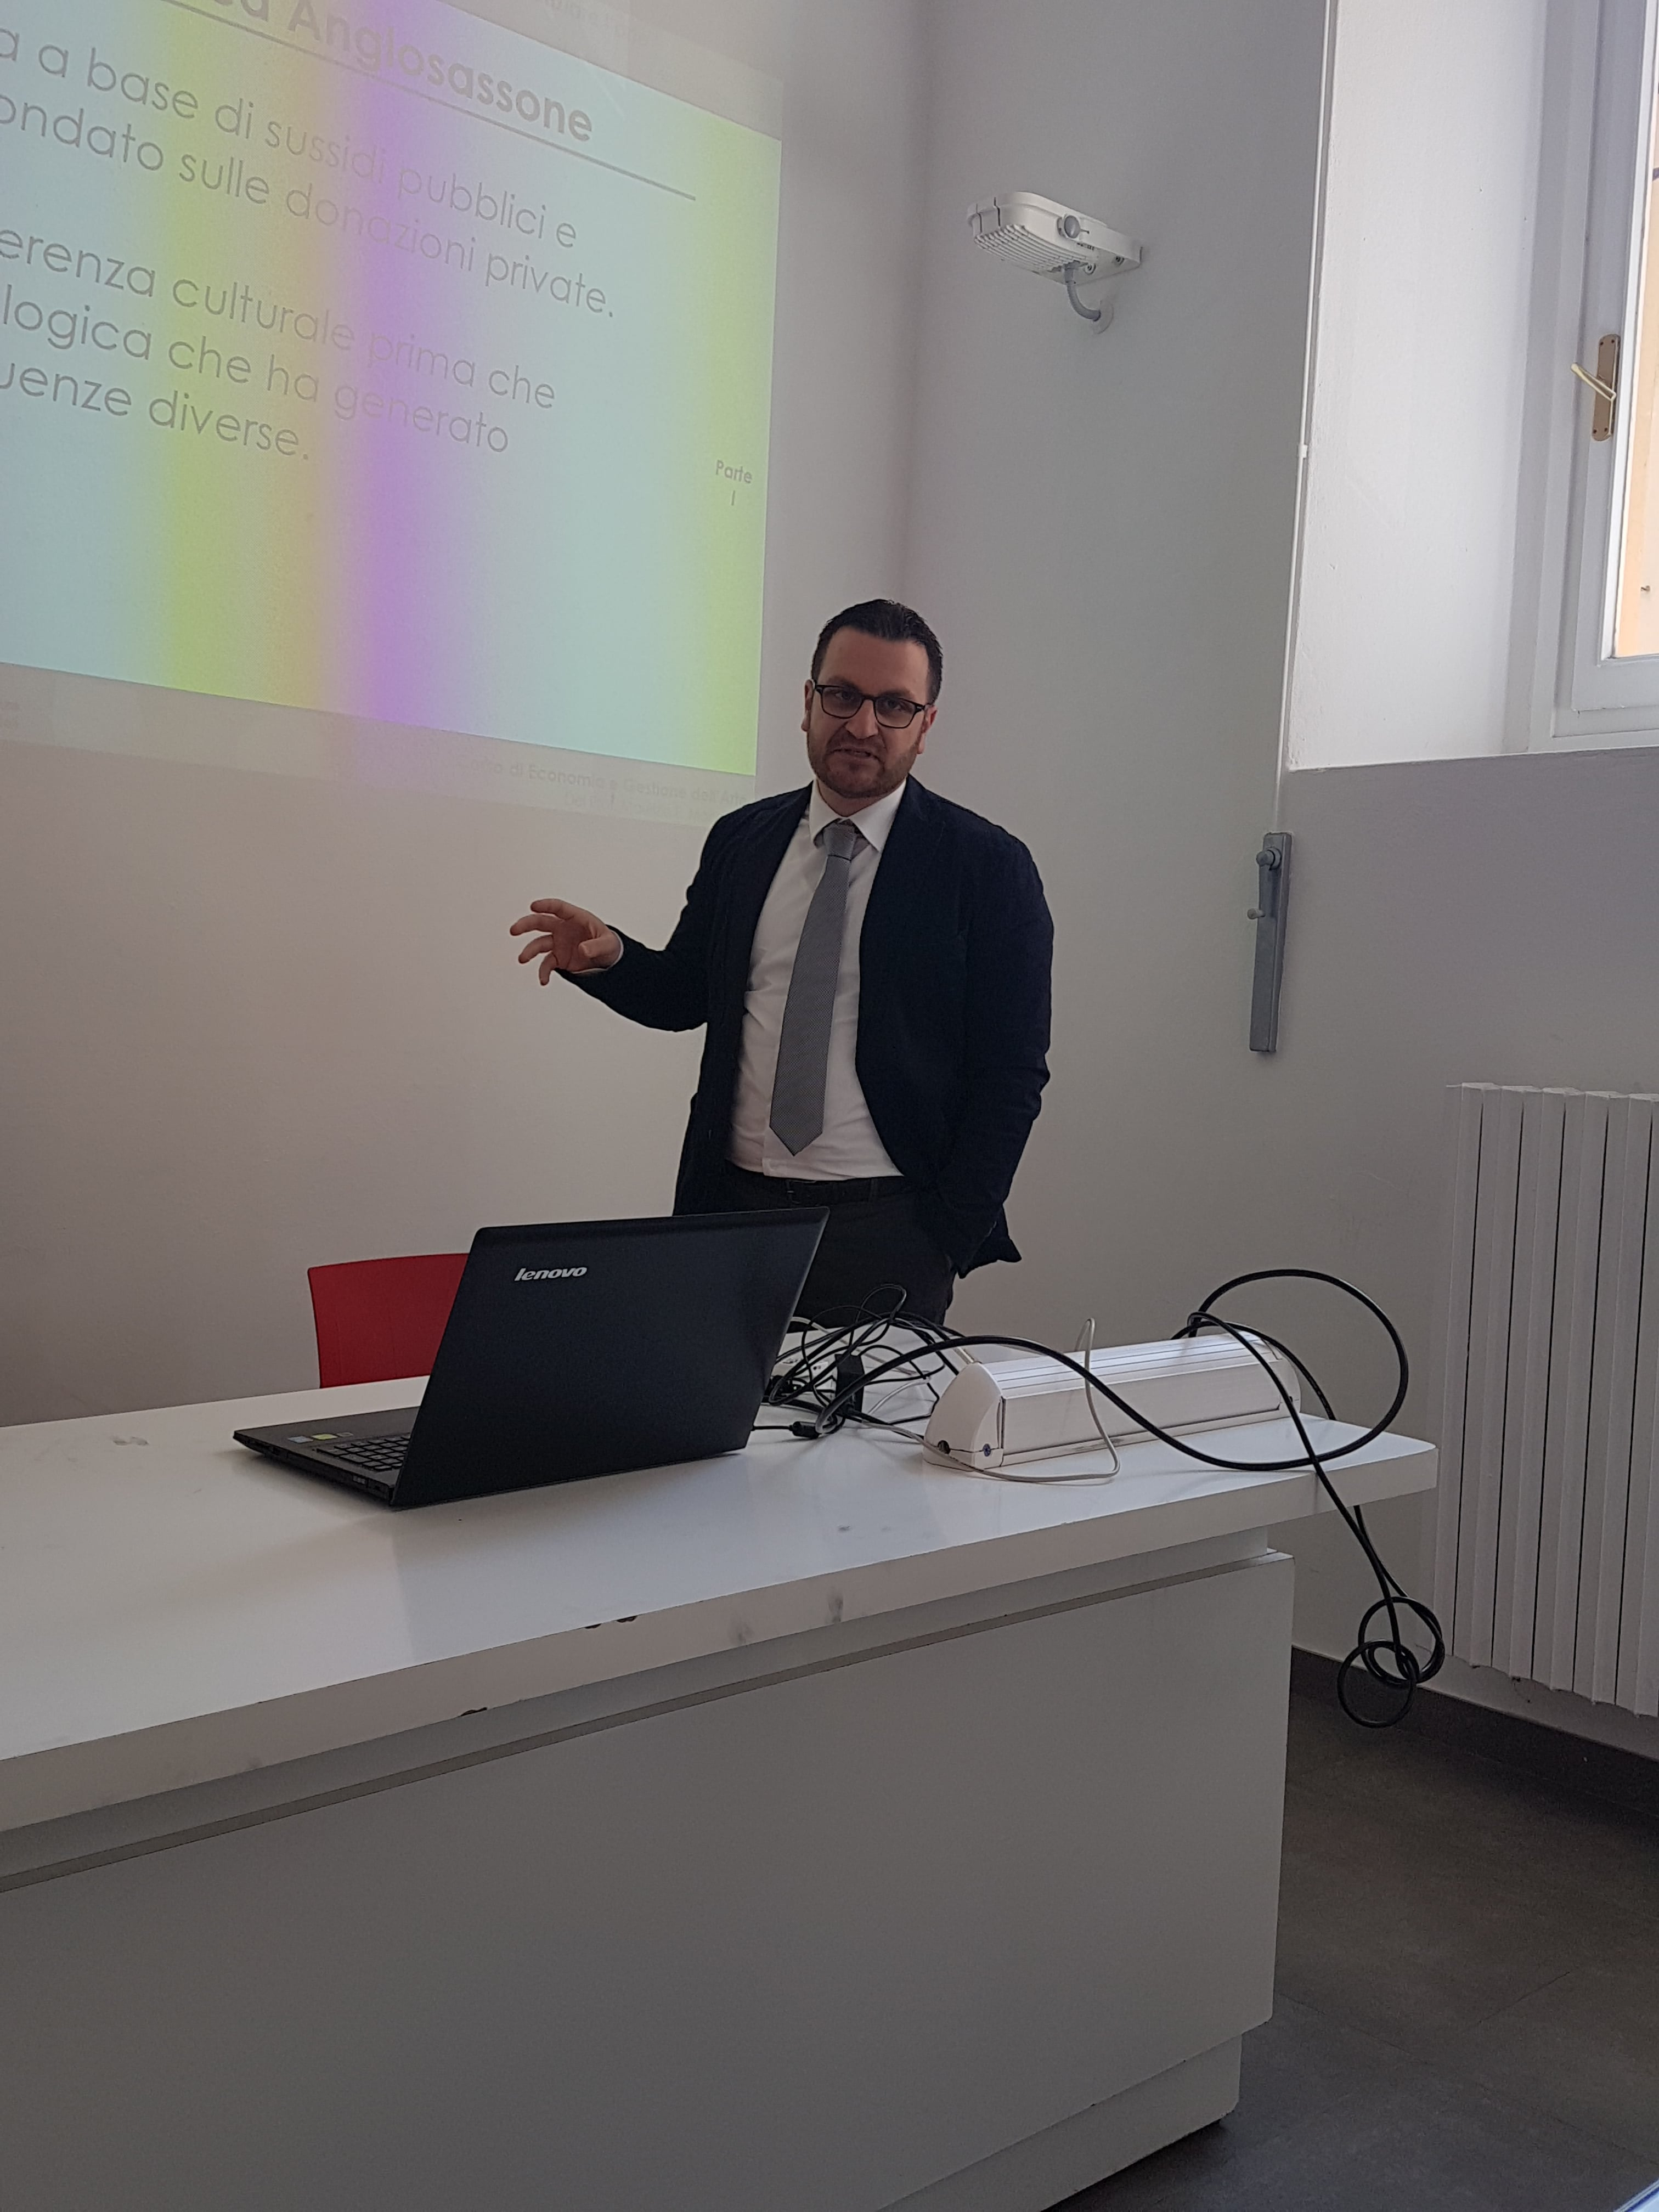 seminario Antonio Napolitano a.a. 2018/19